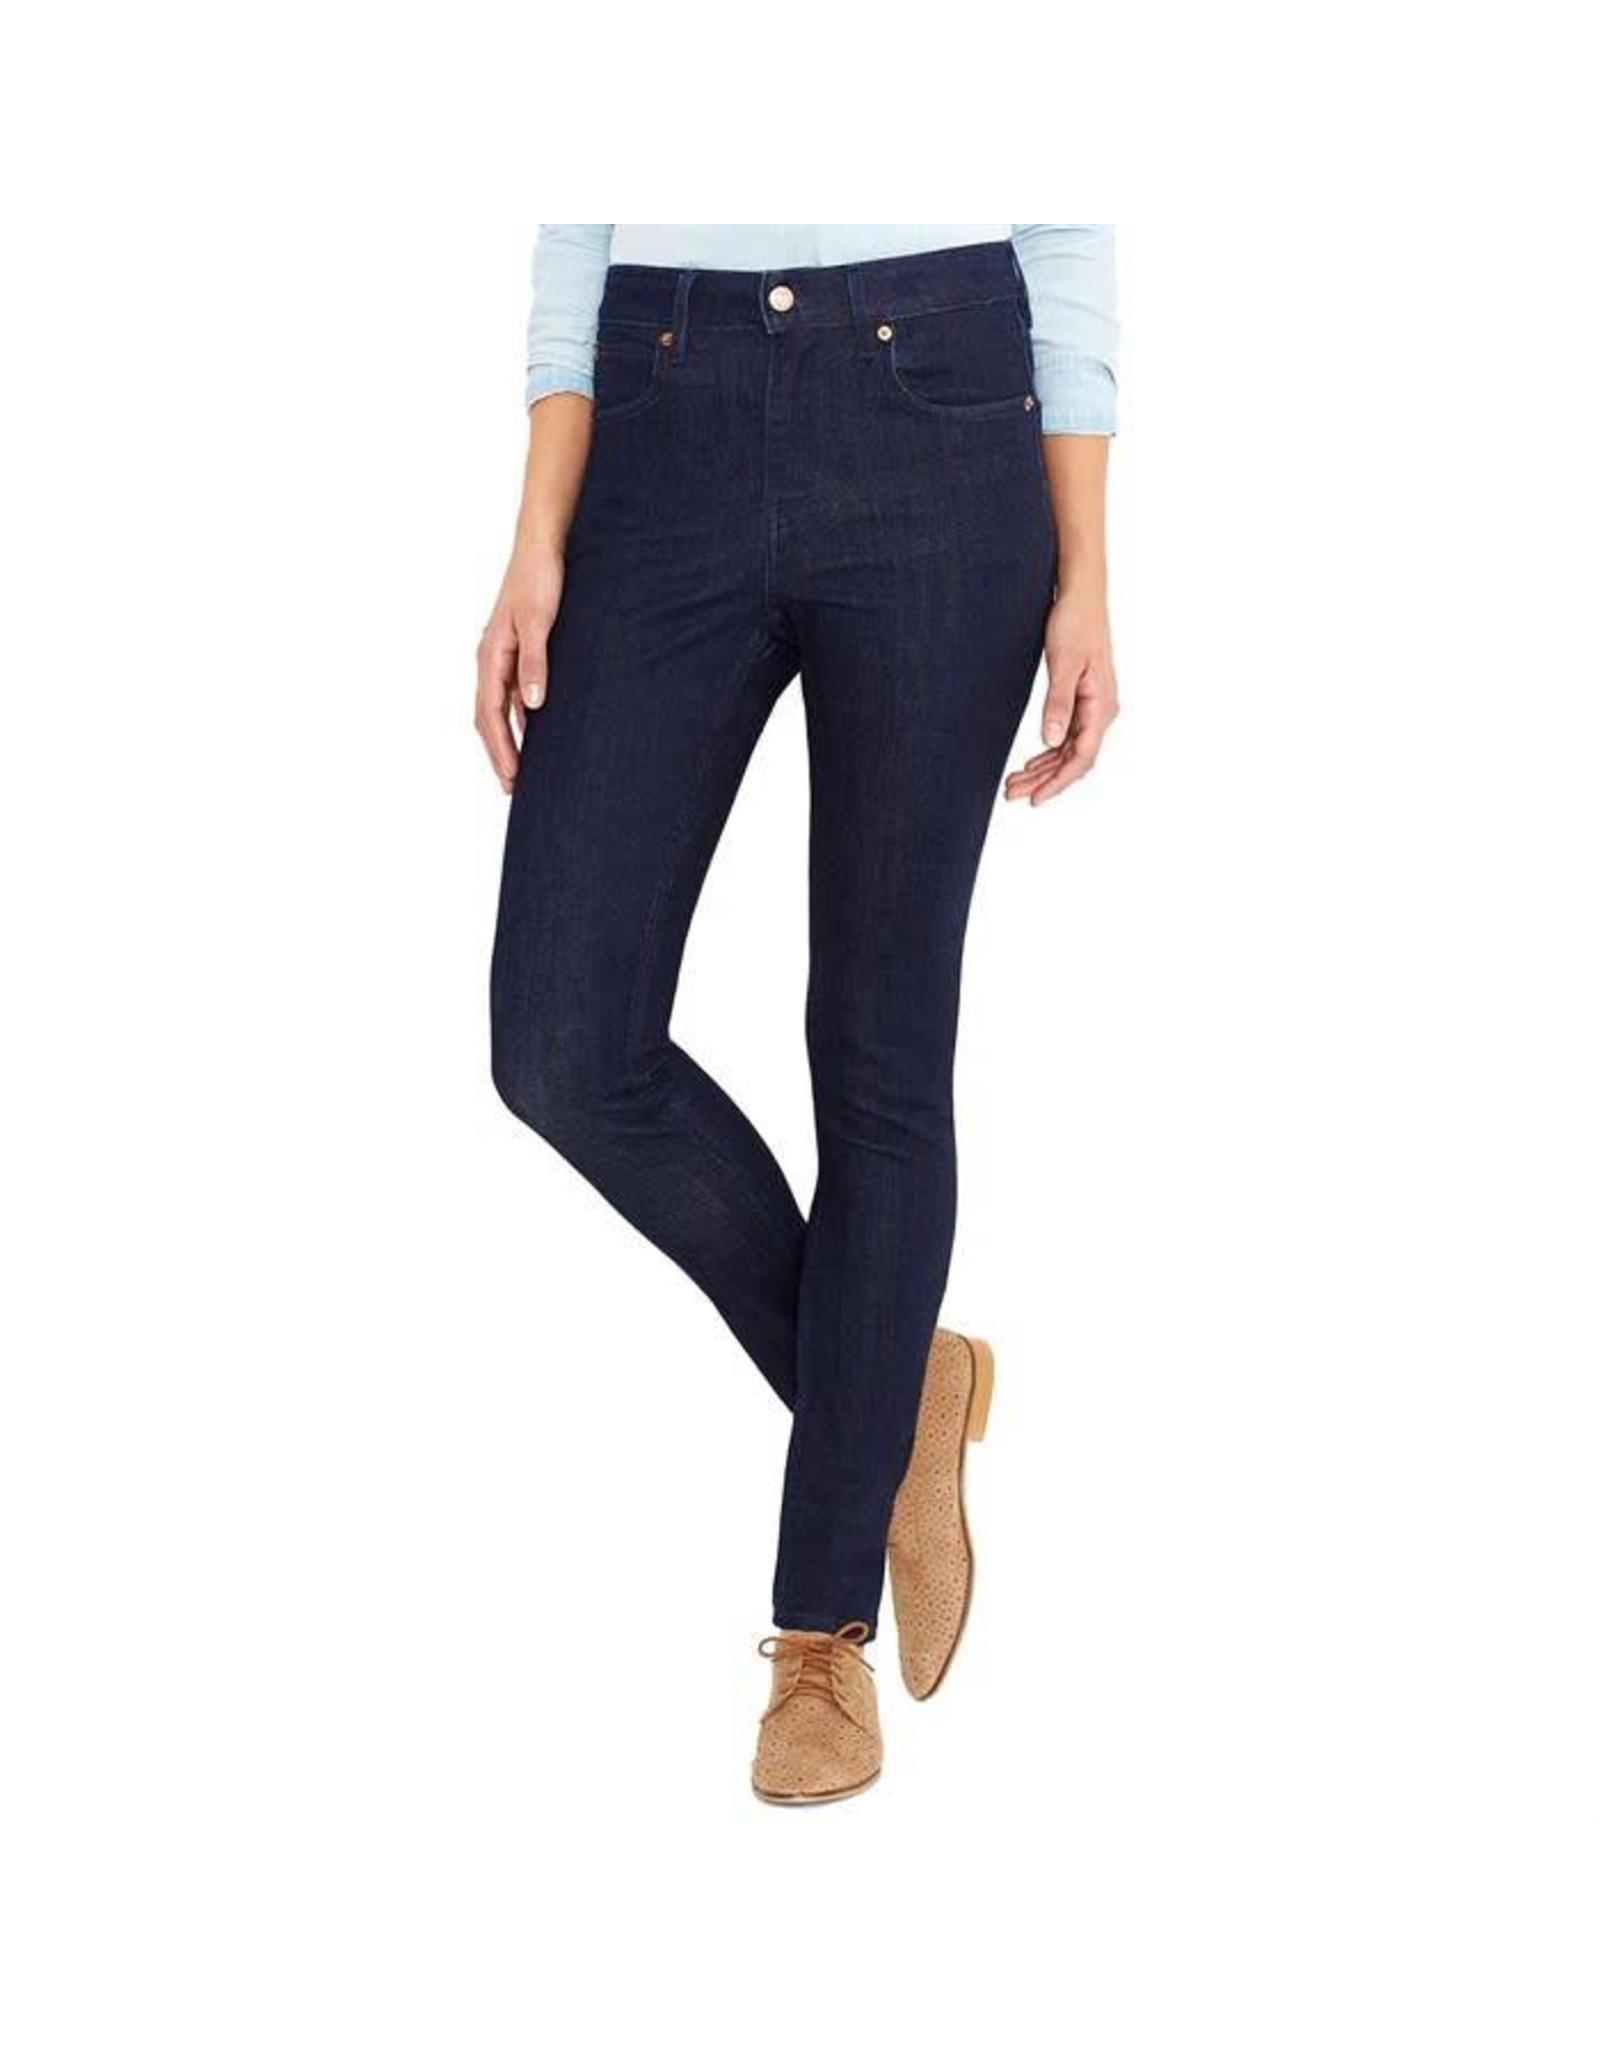 LEVI Levi's 721 Ladies Commuter High Skinny Indigo Jeans - 26 X 32